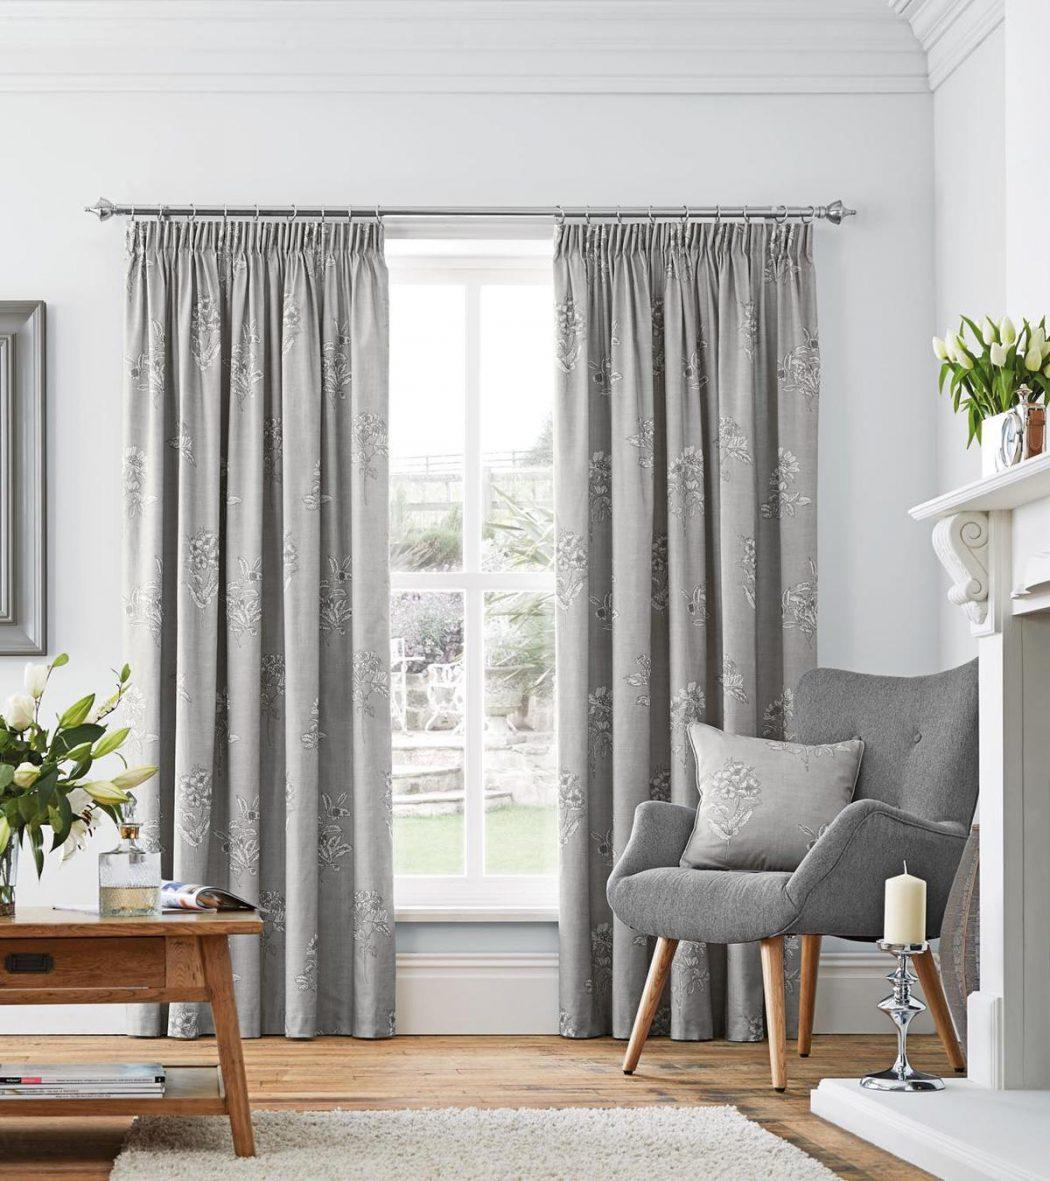 flora-dove-grey 20+ Hottest Curtain Design Ideas for 2021